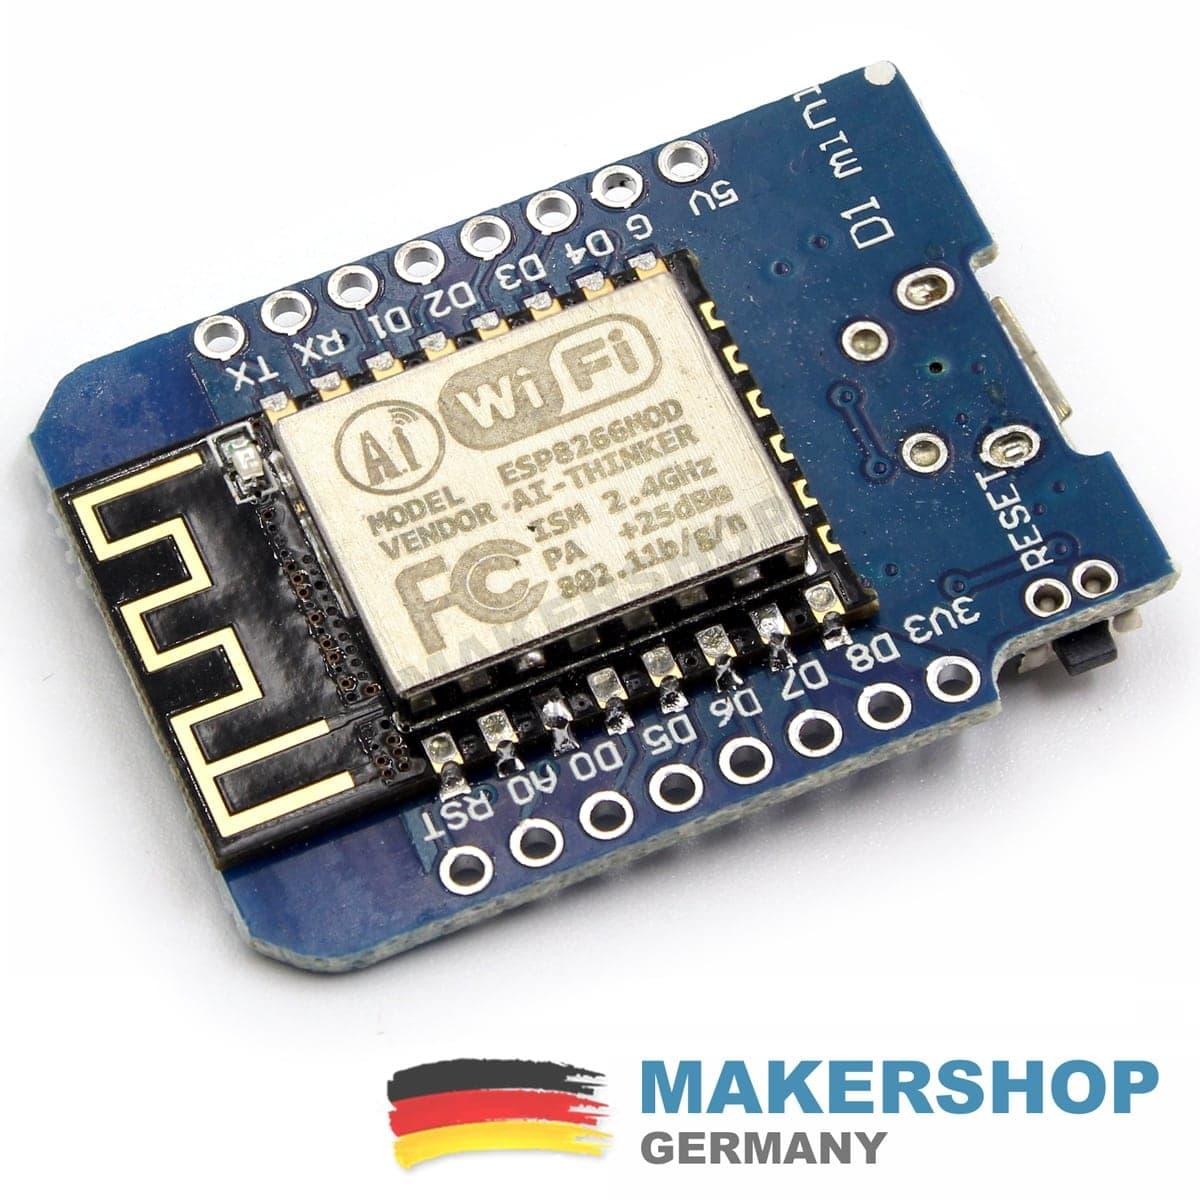 Projekt Box Gehäuse Plastik Project Wemos Arduino Nano NodeMCU Mini 10x6x2.5cm